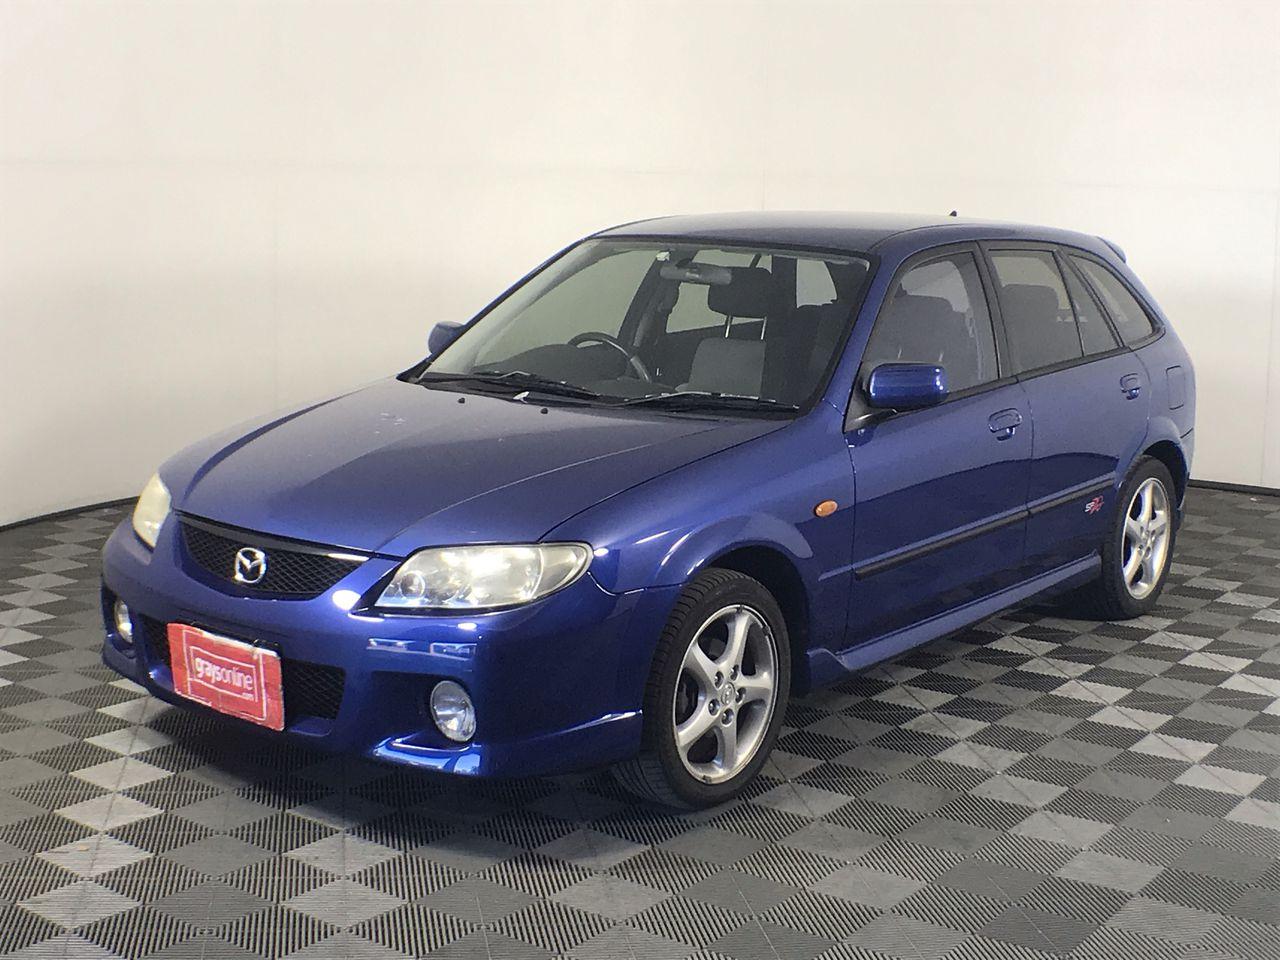 2001 Mazda 323 Astina SP20 BJ Automatic Hatchback